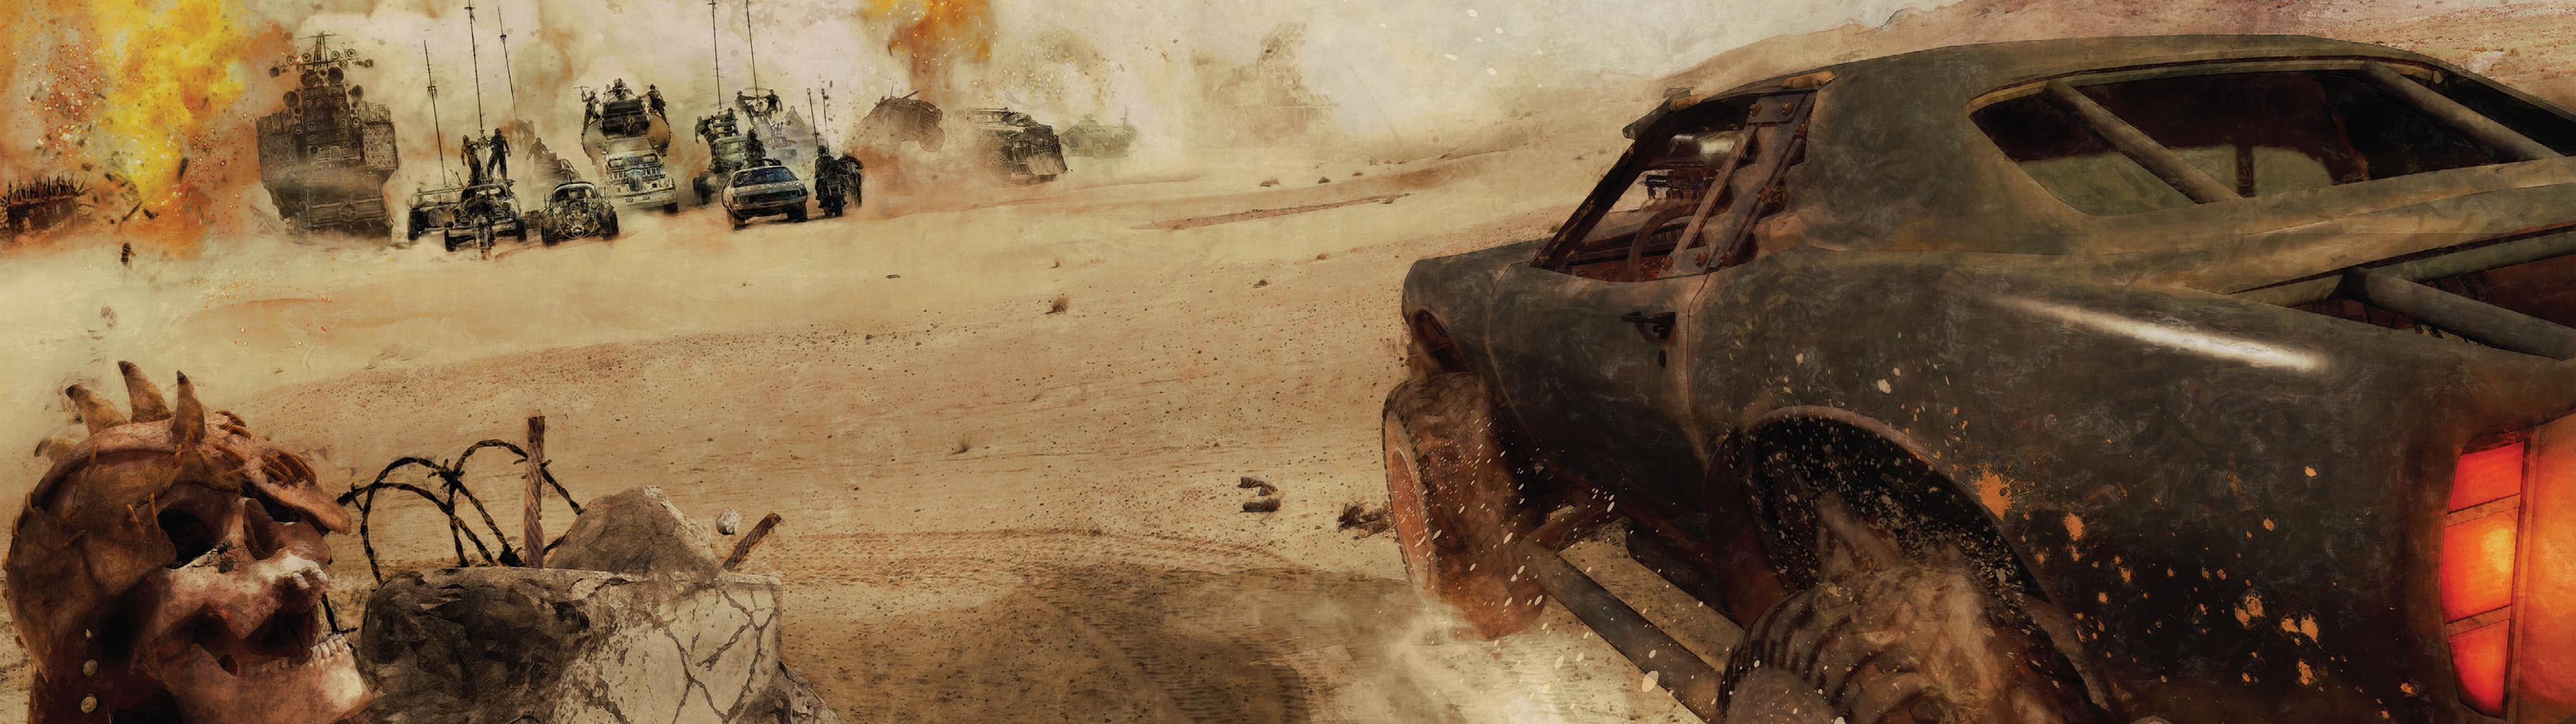 Res: 3840x1080, Movie - Mad Max: Fury Road Wallpaper